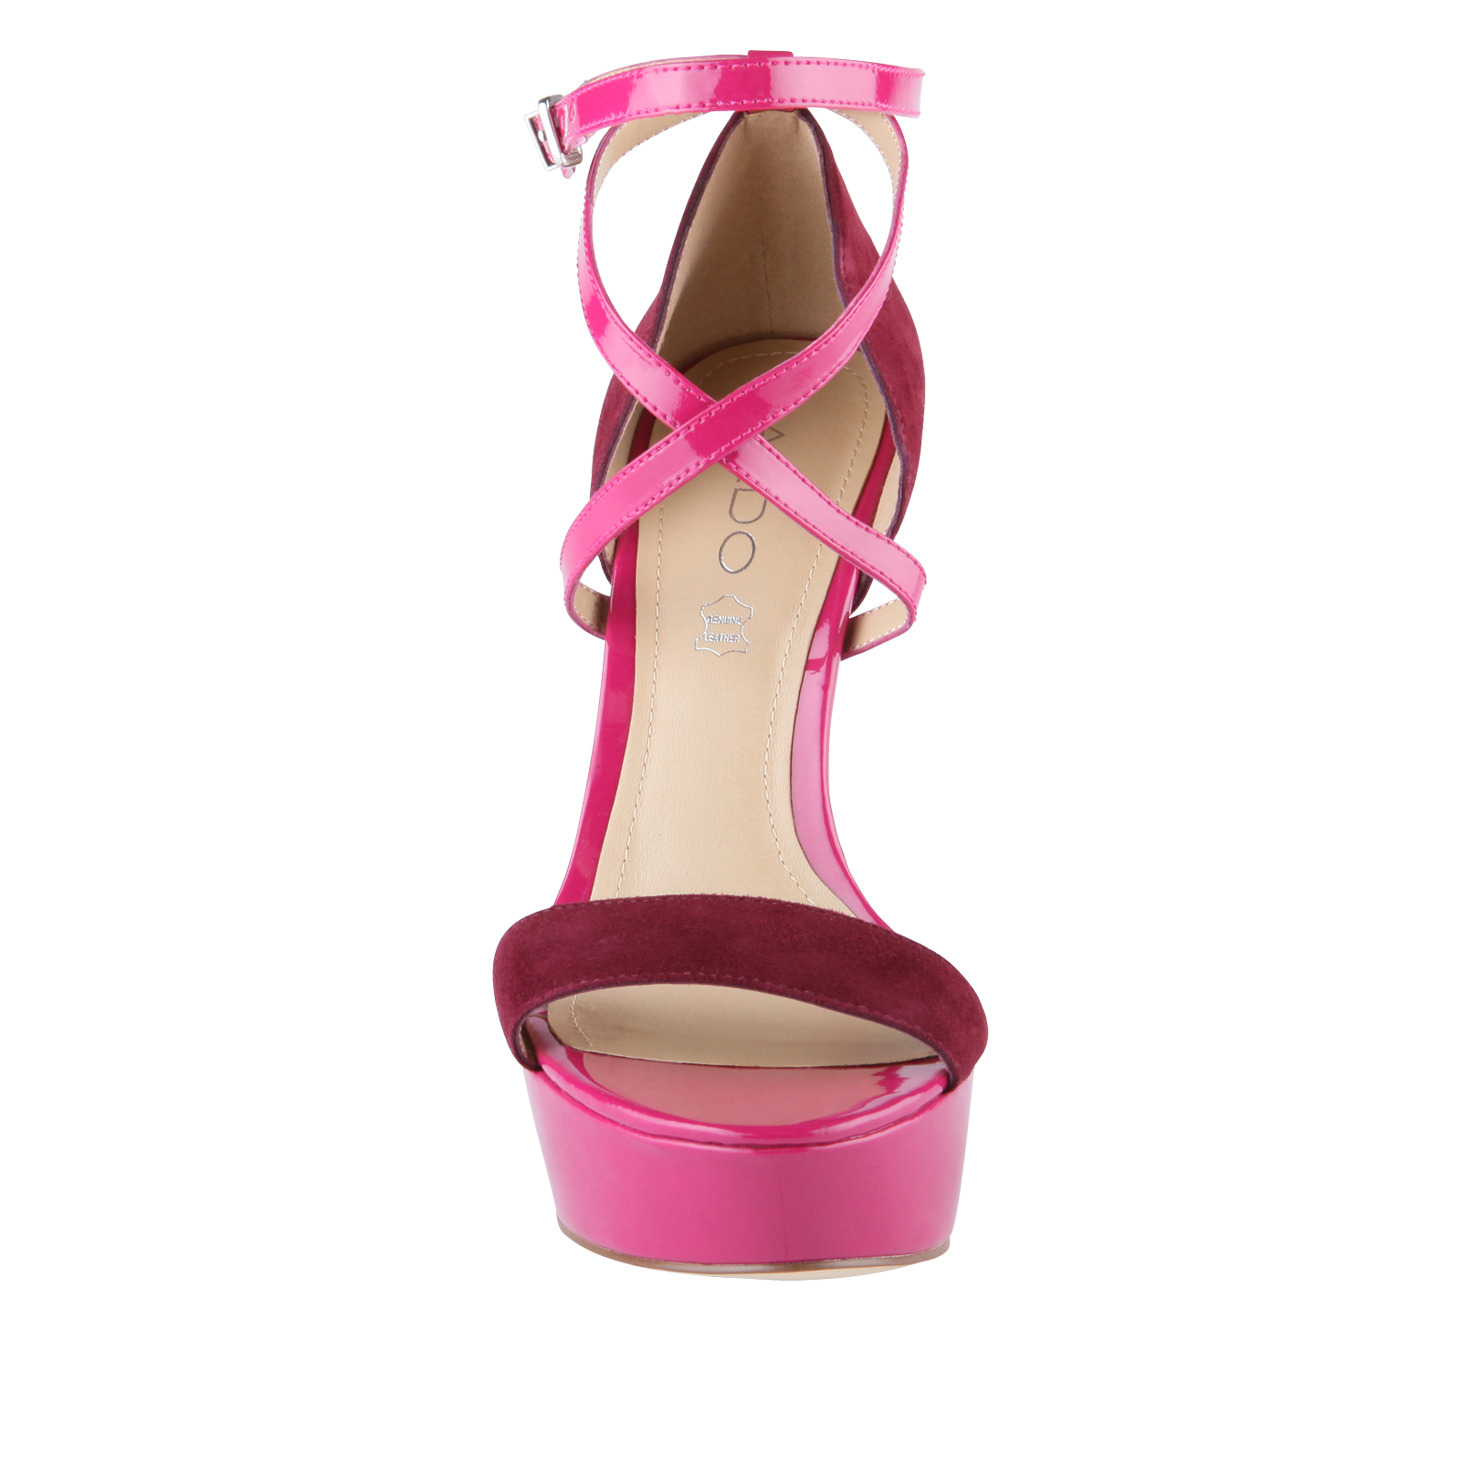 64825f4674a Lyst - Aldo Playas in Pink